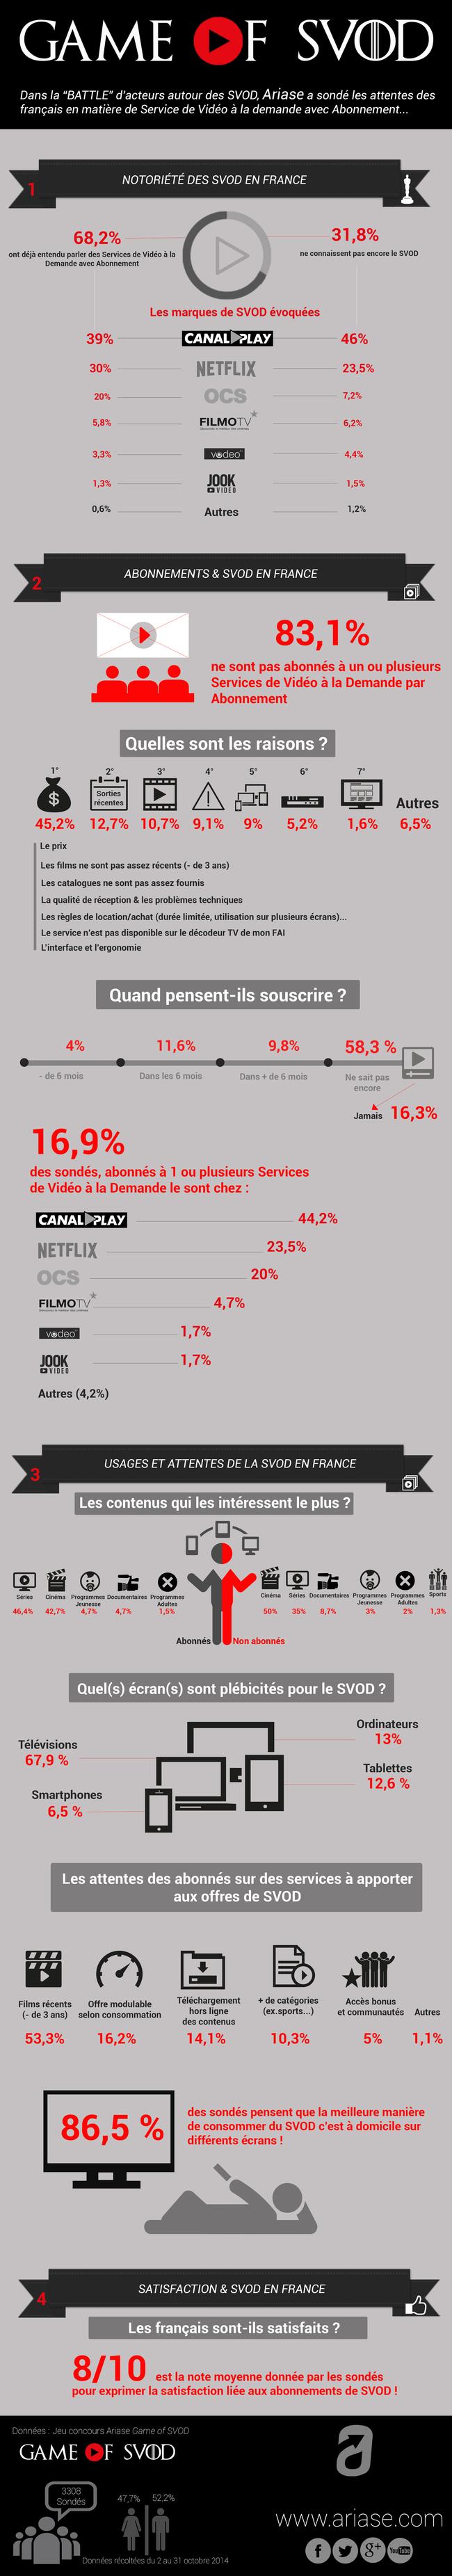 infographie-svod-ariase.jpg